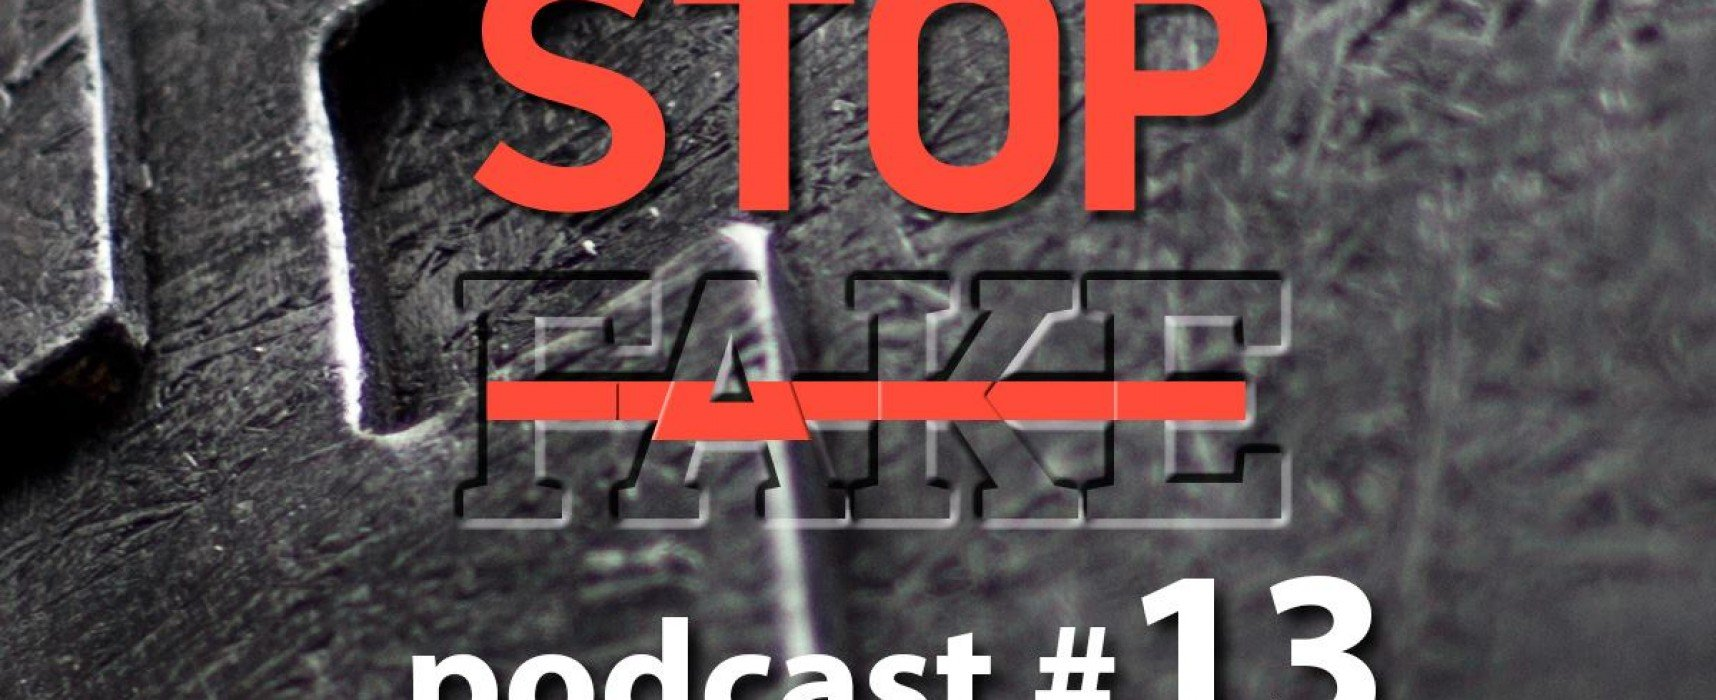 StopFake podcast#13